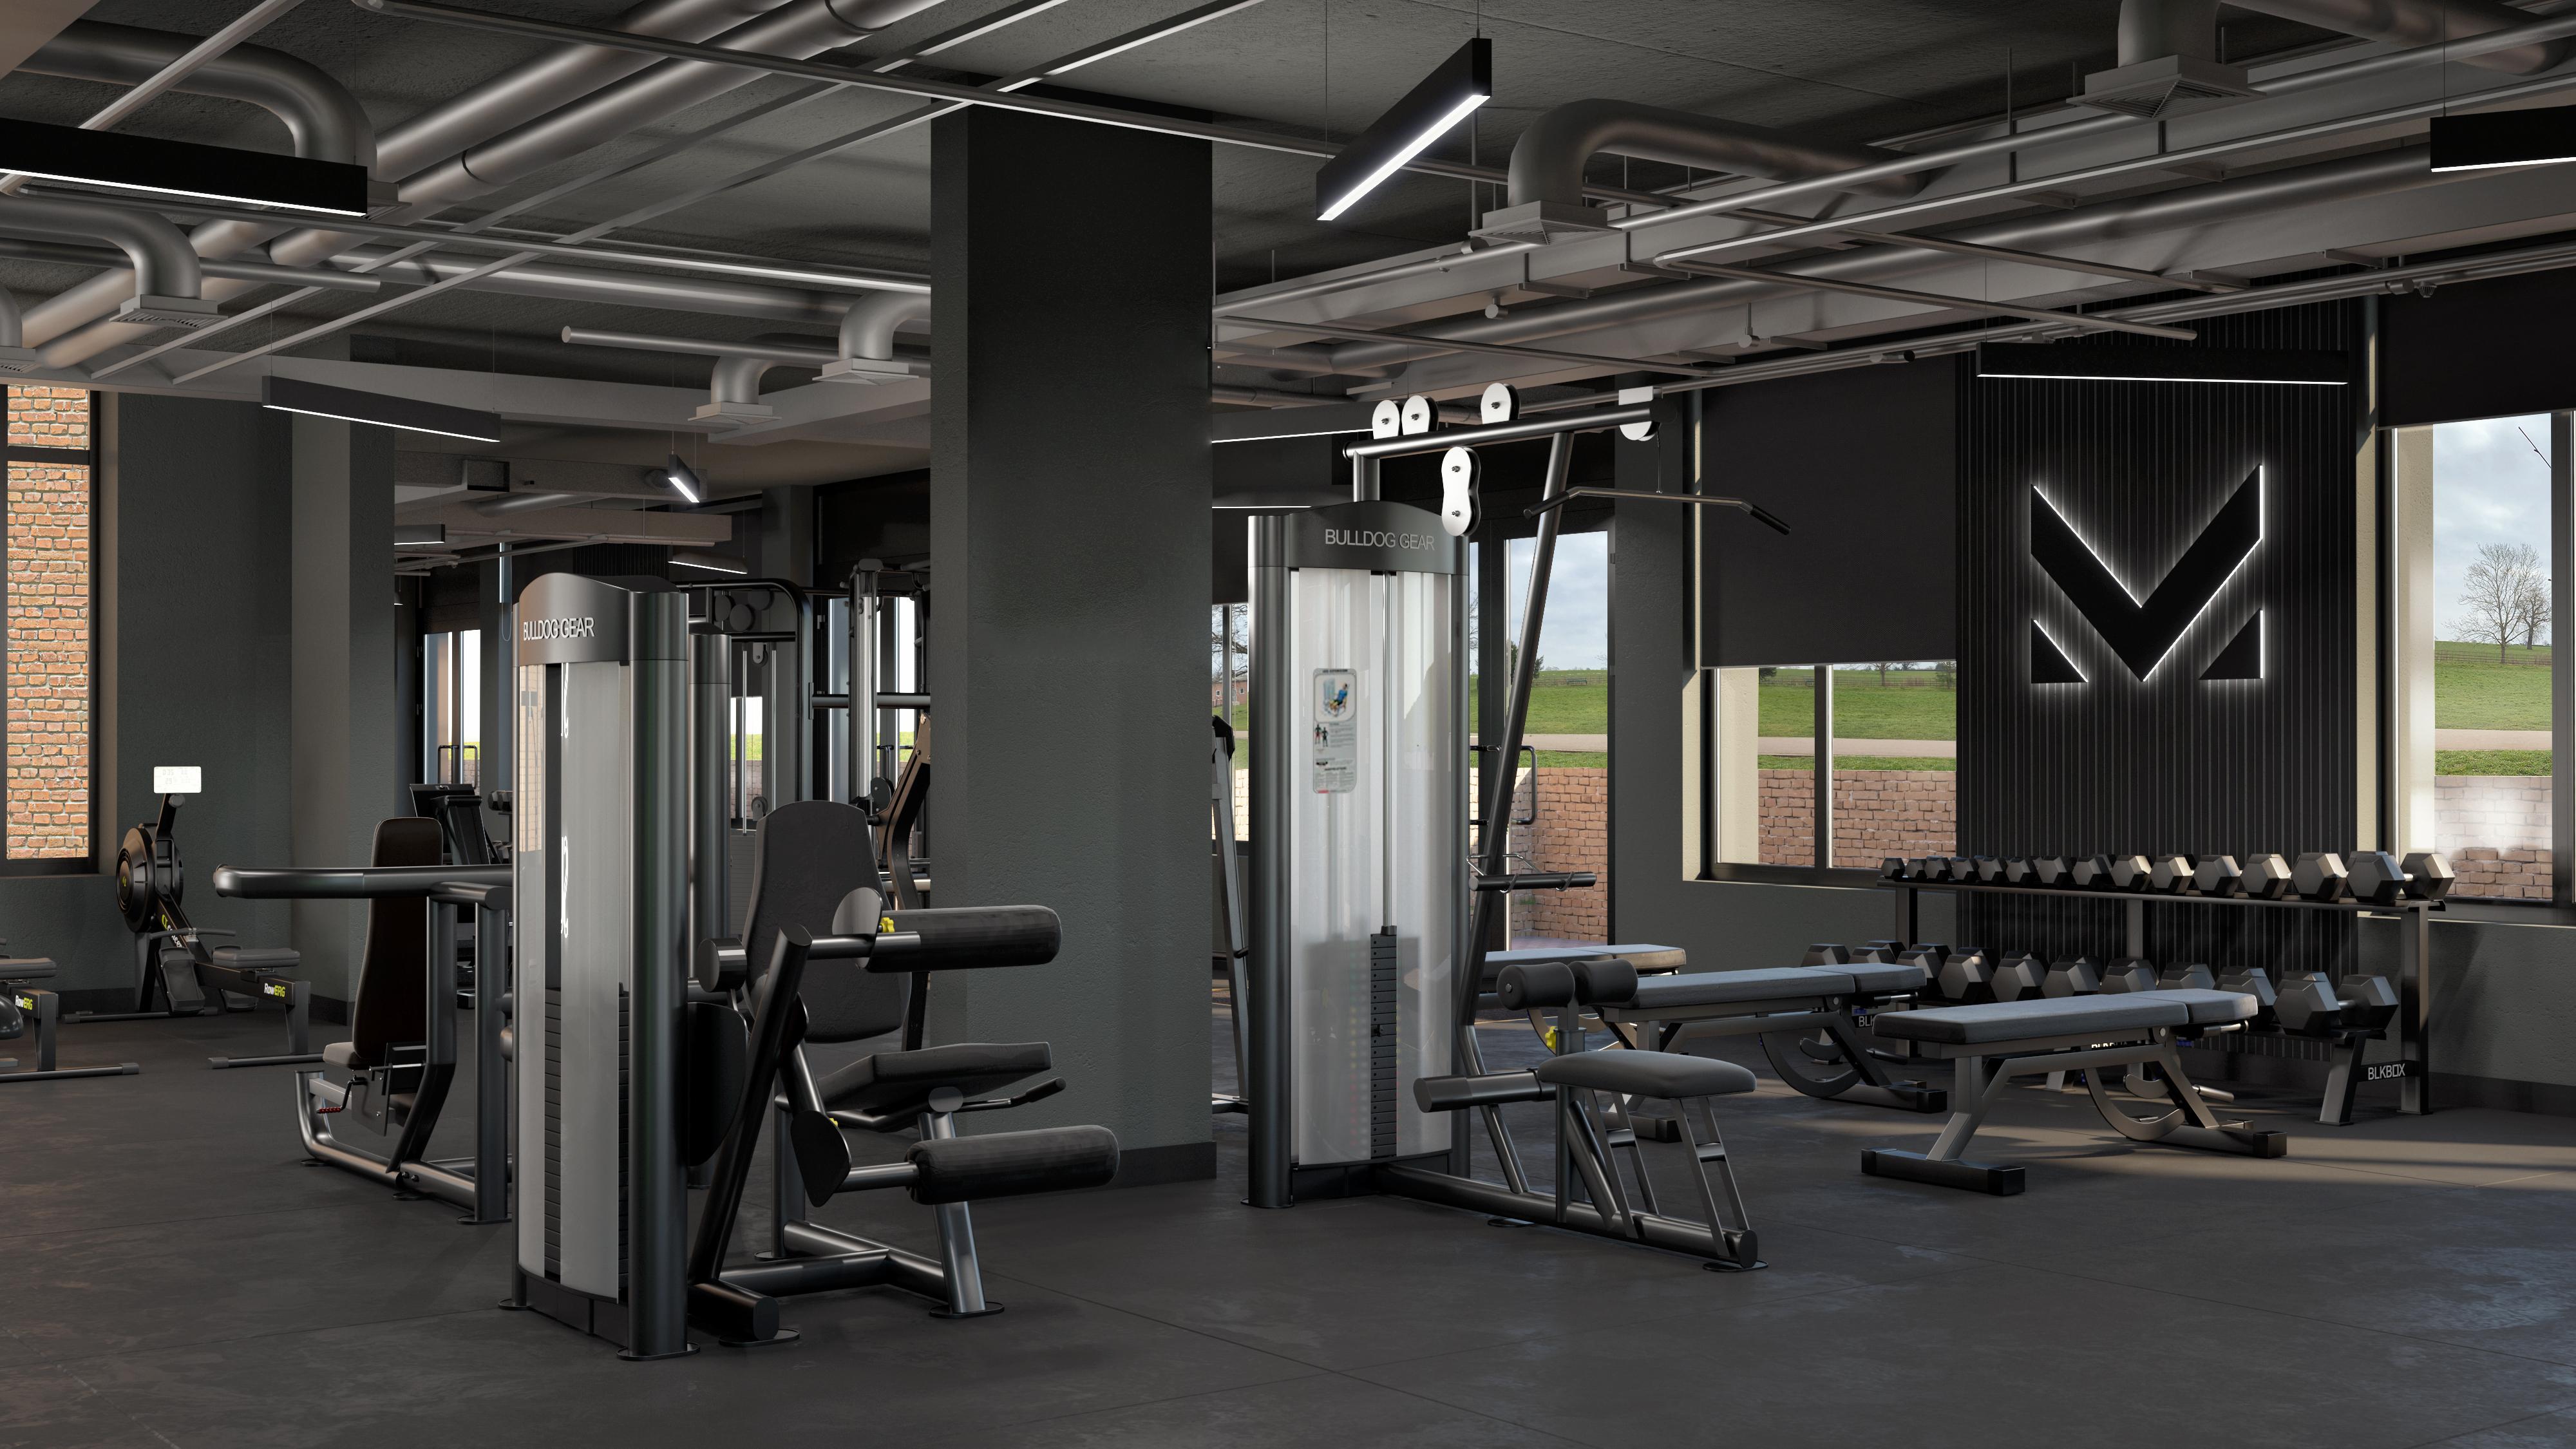 student-accommodation-guildford-guilden-park-gym-2